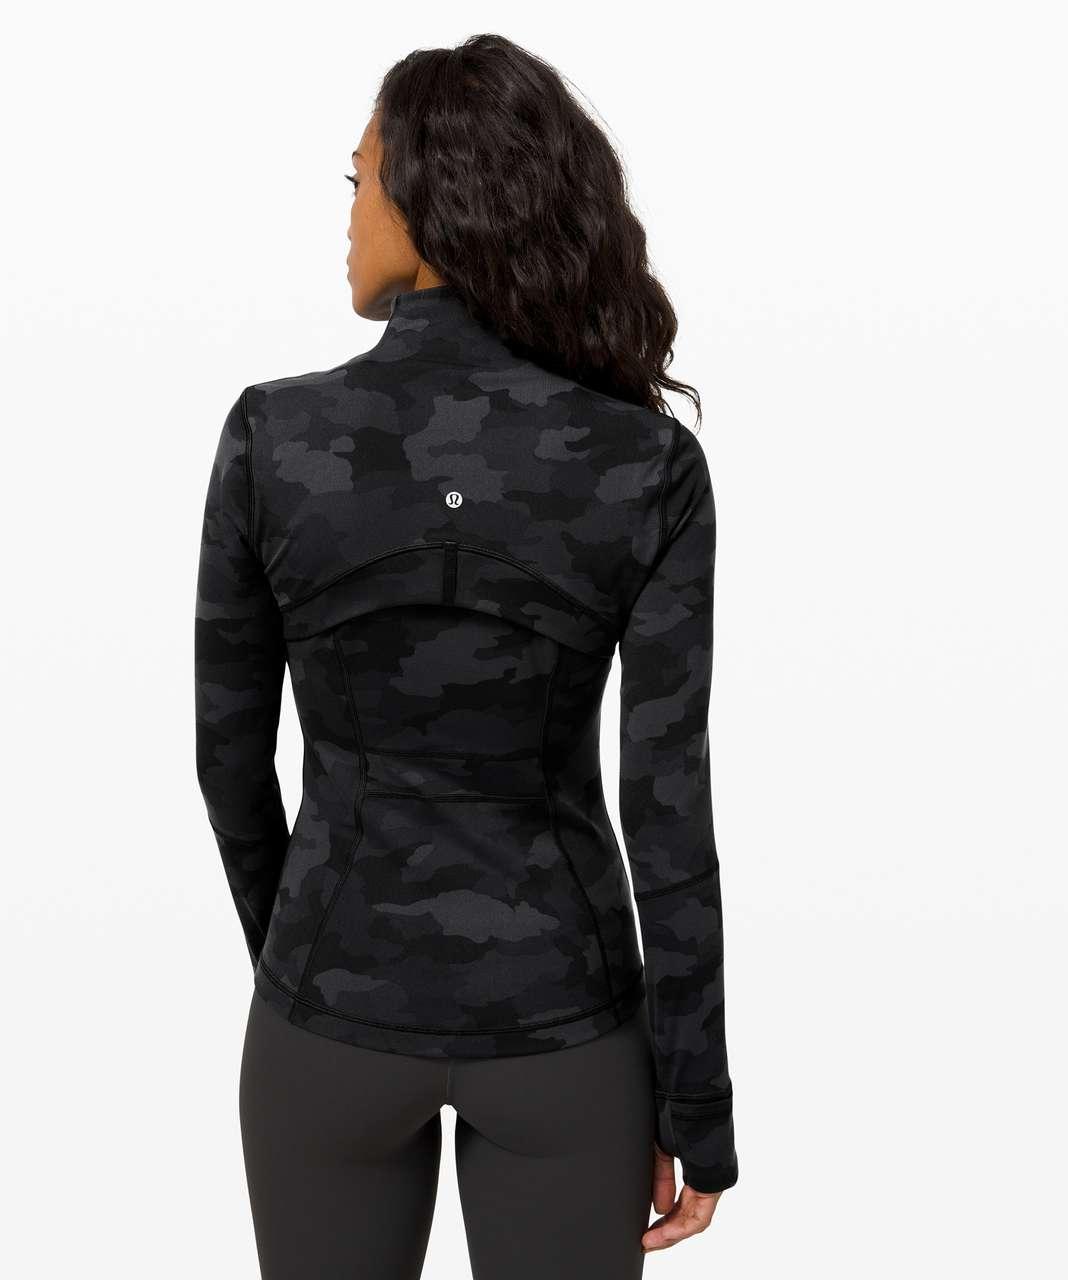 Lululemon Define Jacket - Heritage 365 Camo Deep Coal Multi